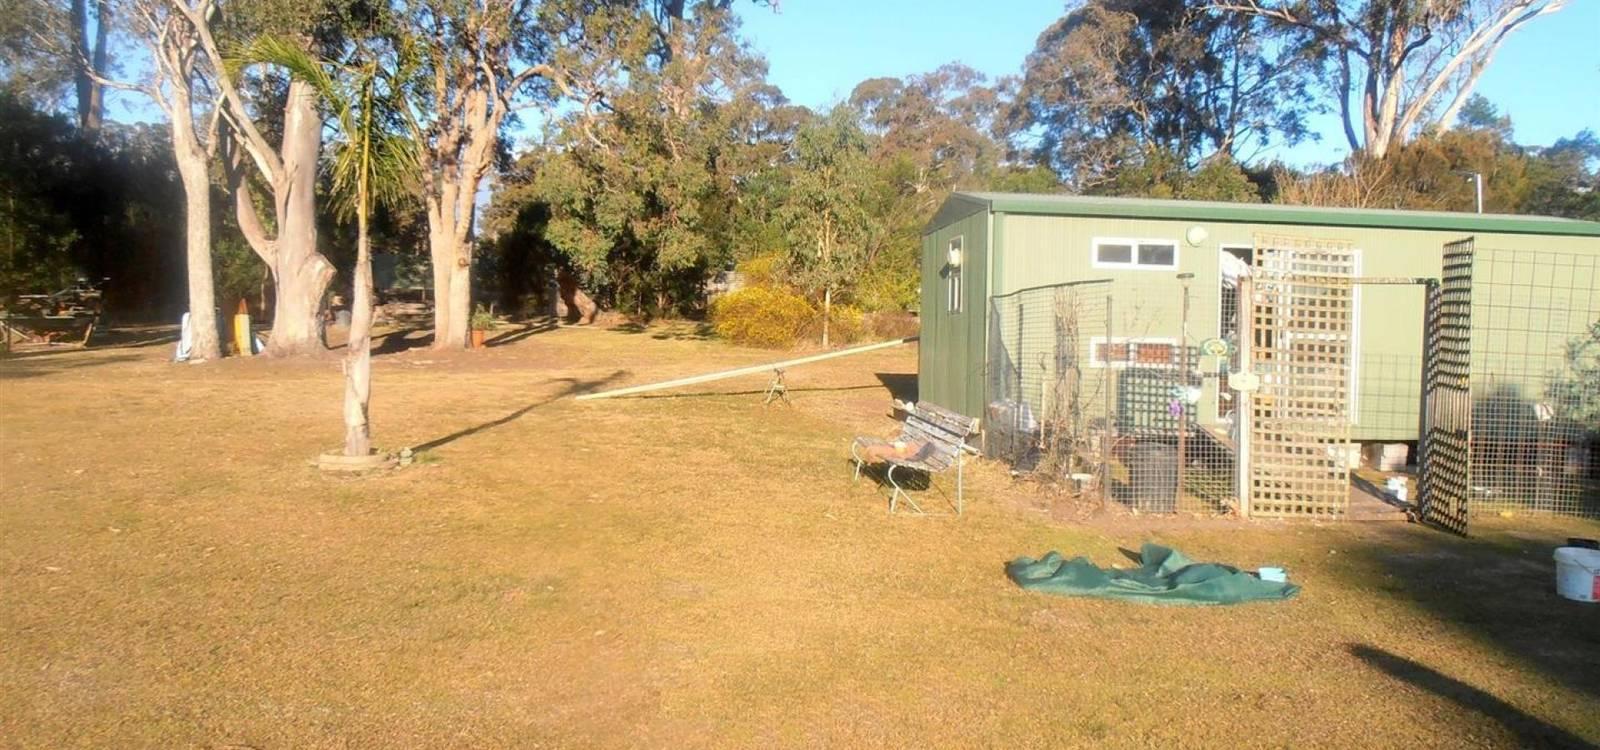 9 Shane Crescent BERGALIA, NSW 2537 - photo 1